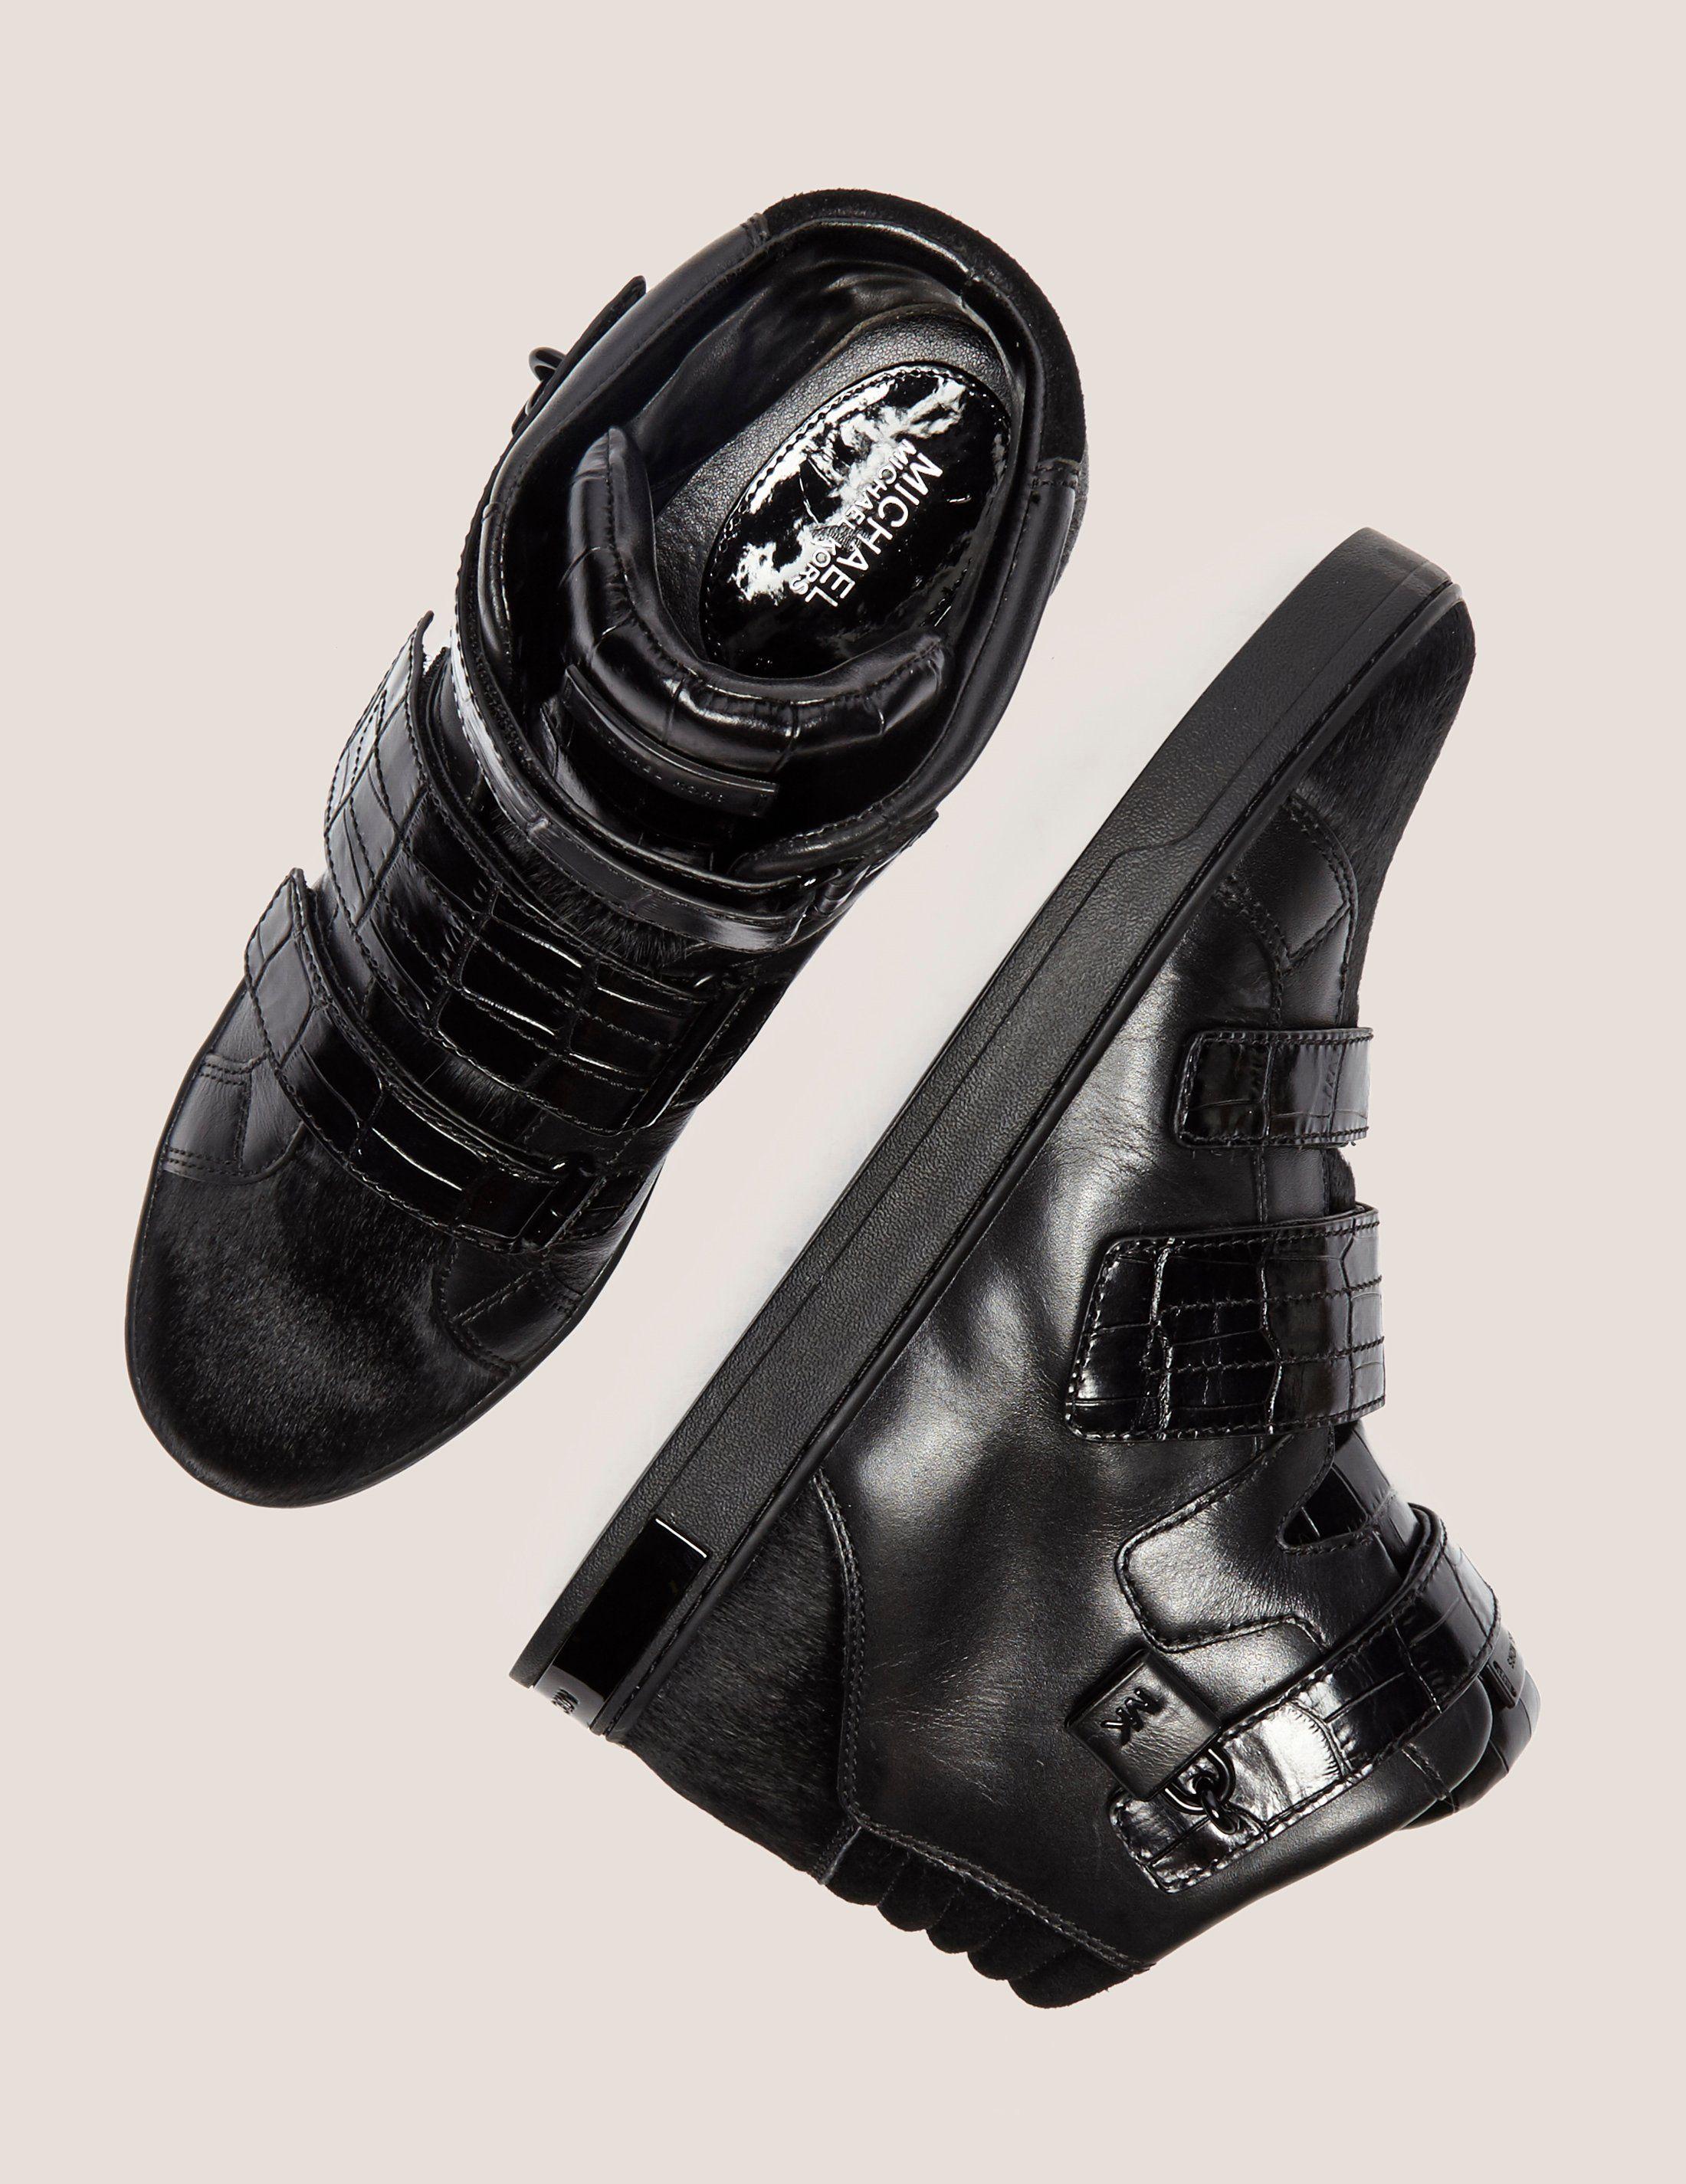 Michael Kors Randi High Top Boots